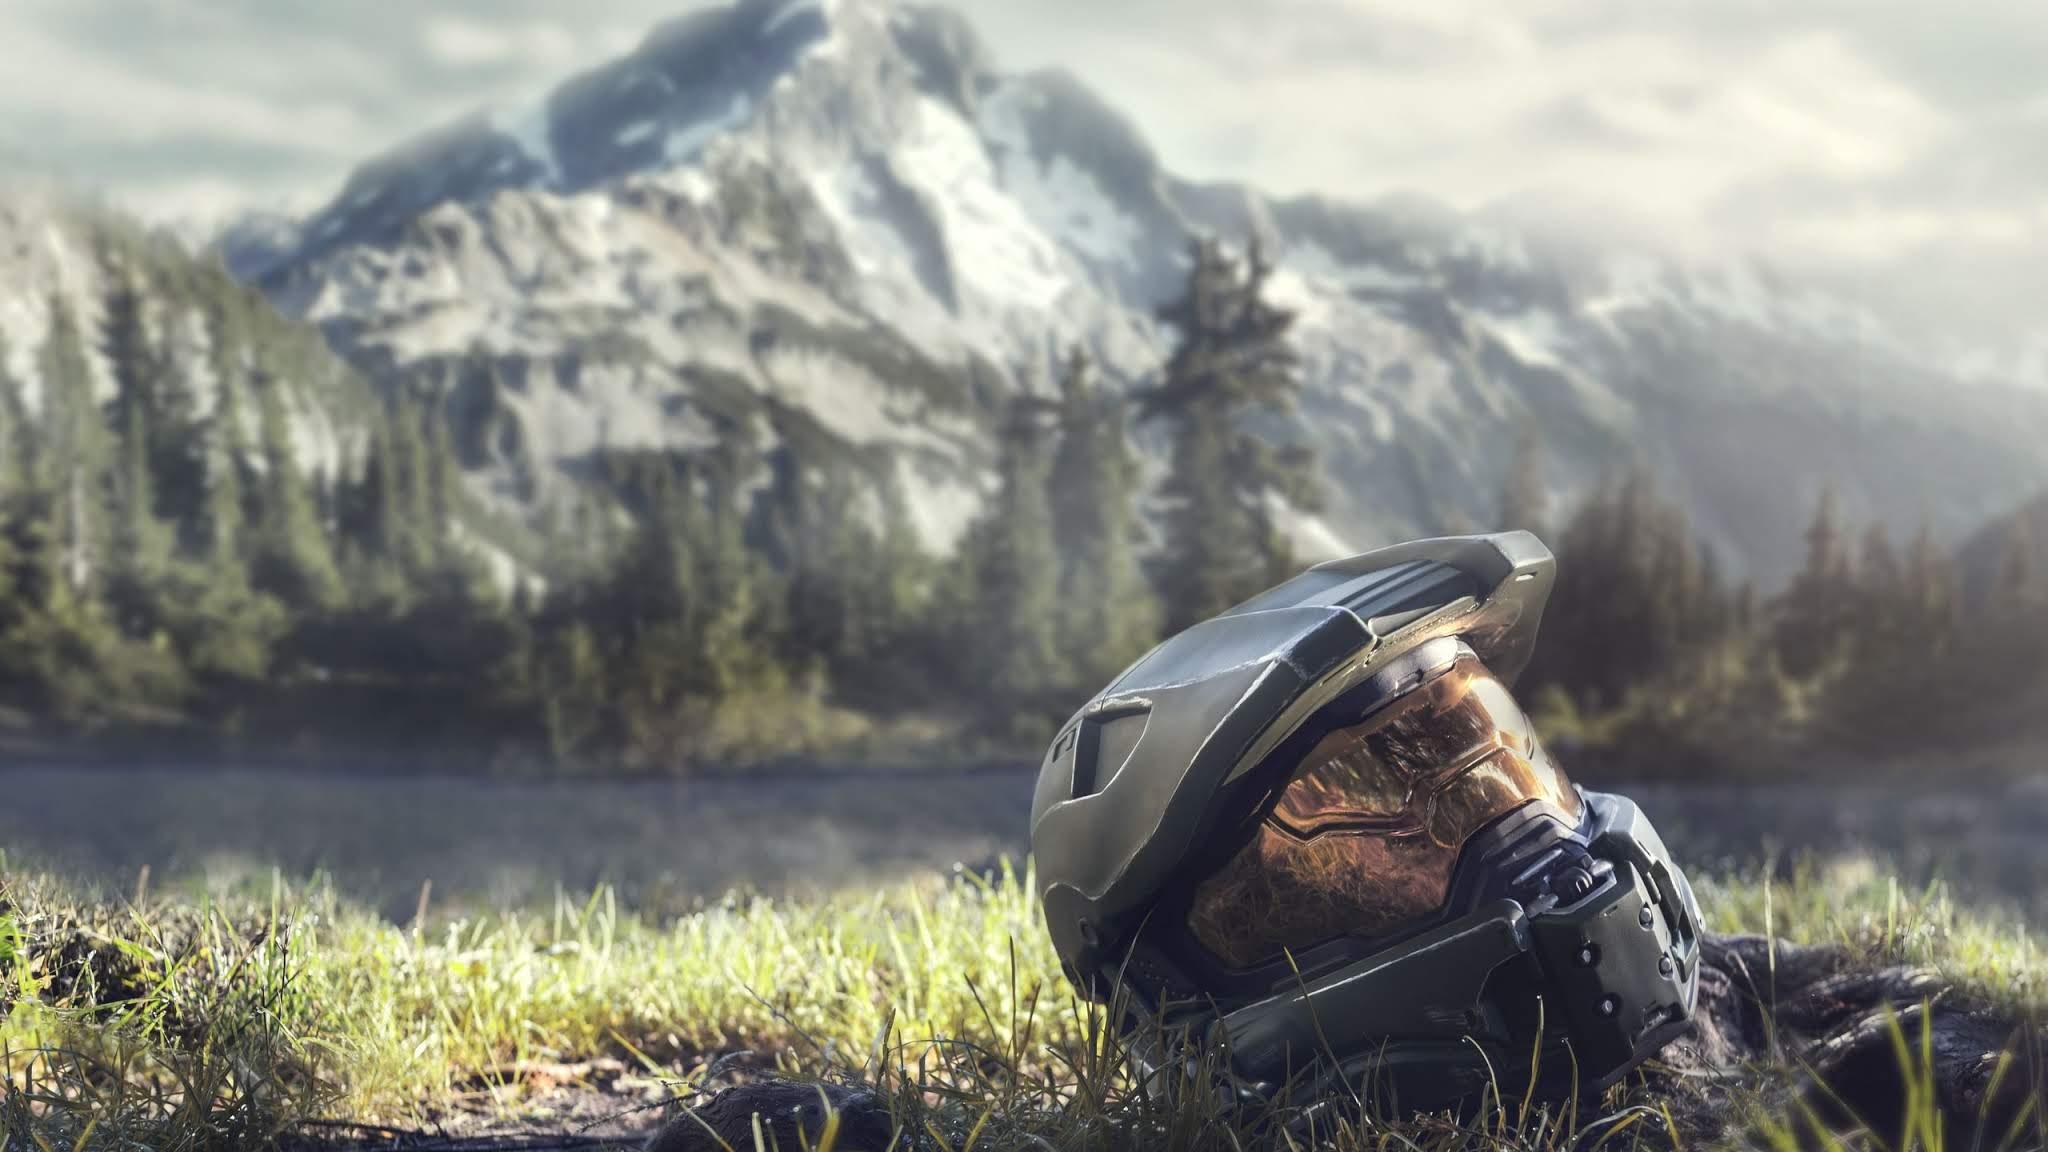 Master Chief Halo Helmet